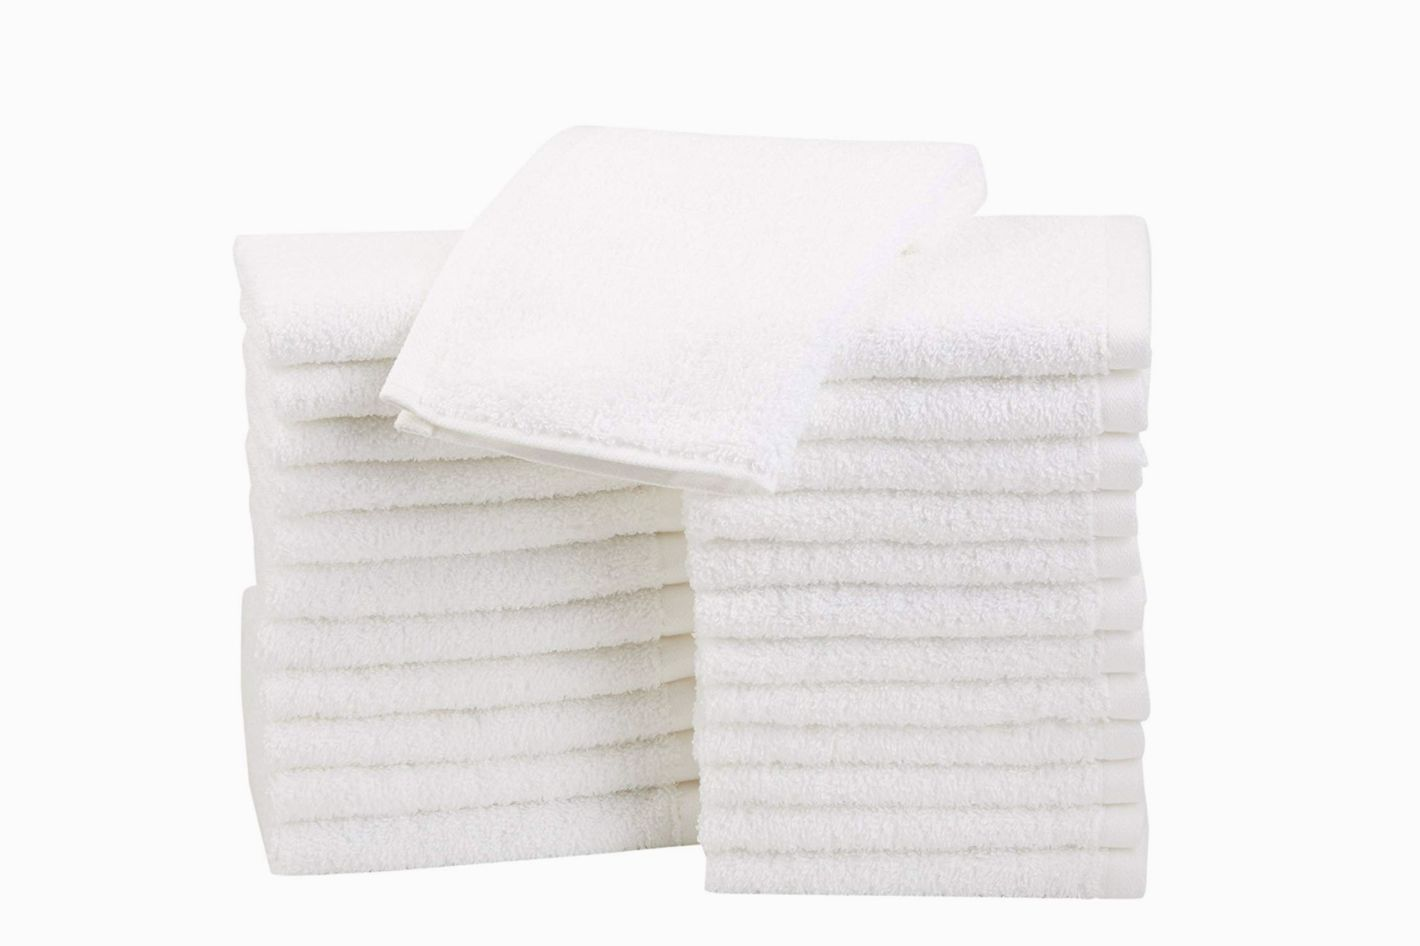 Amazon Basics Cotton Wash Cloths